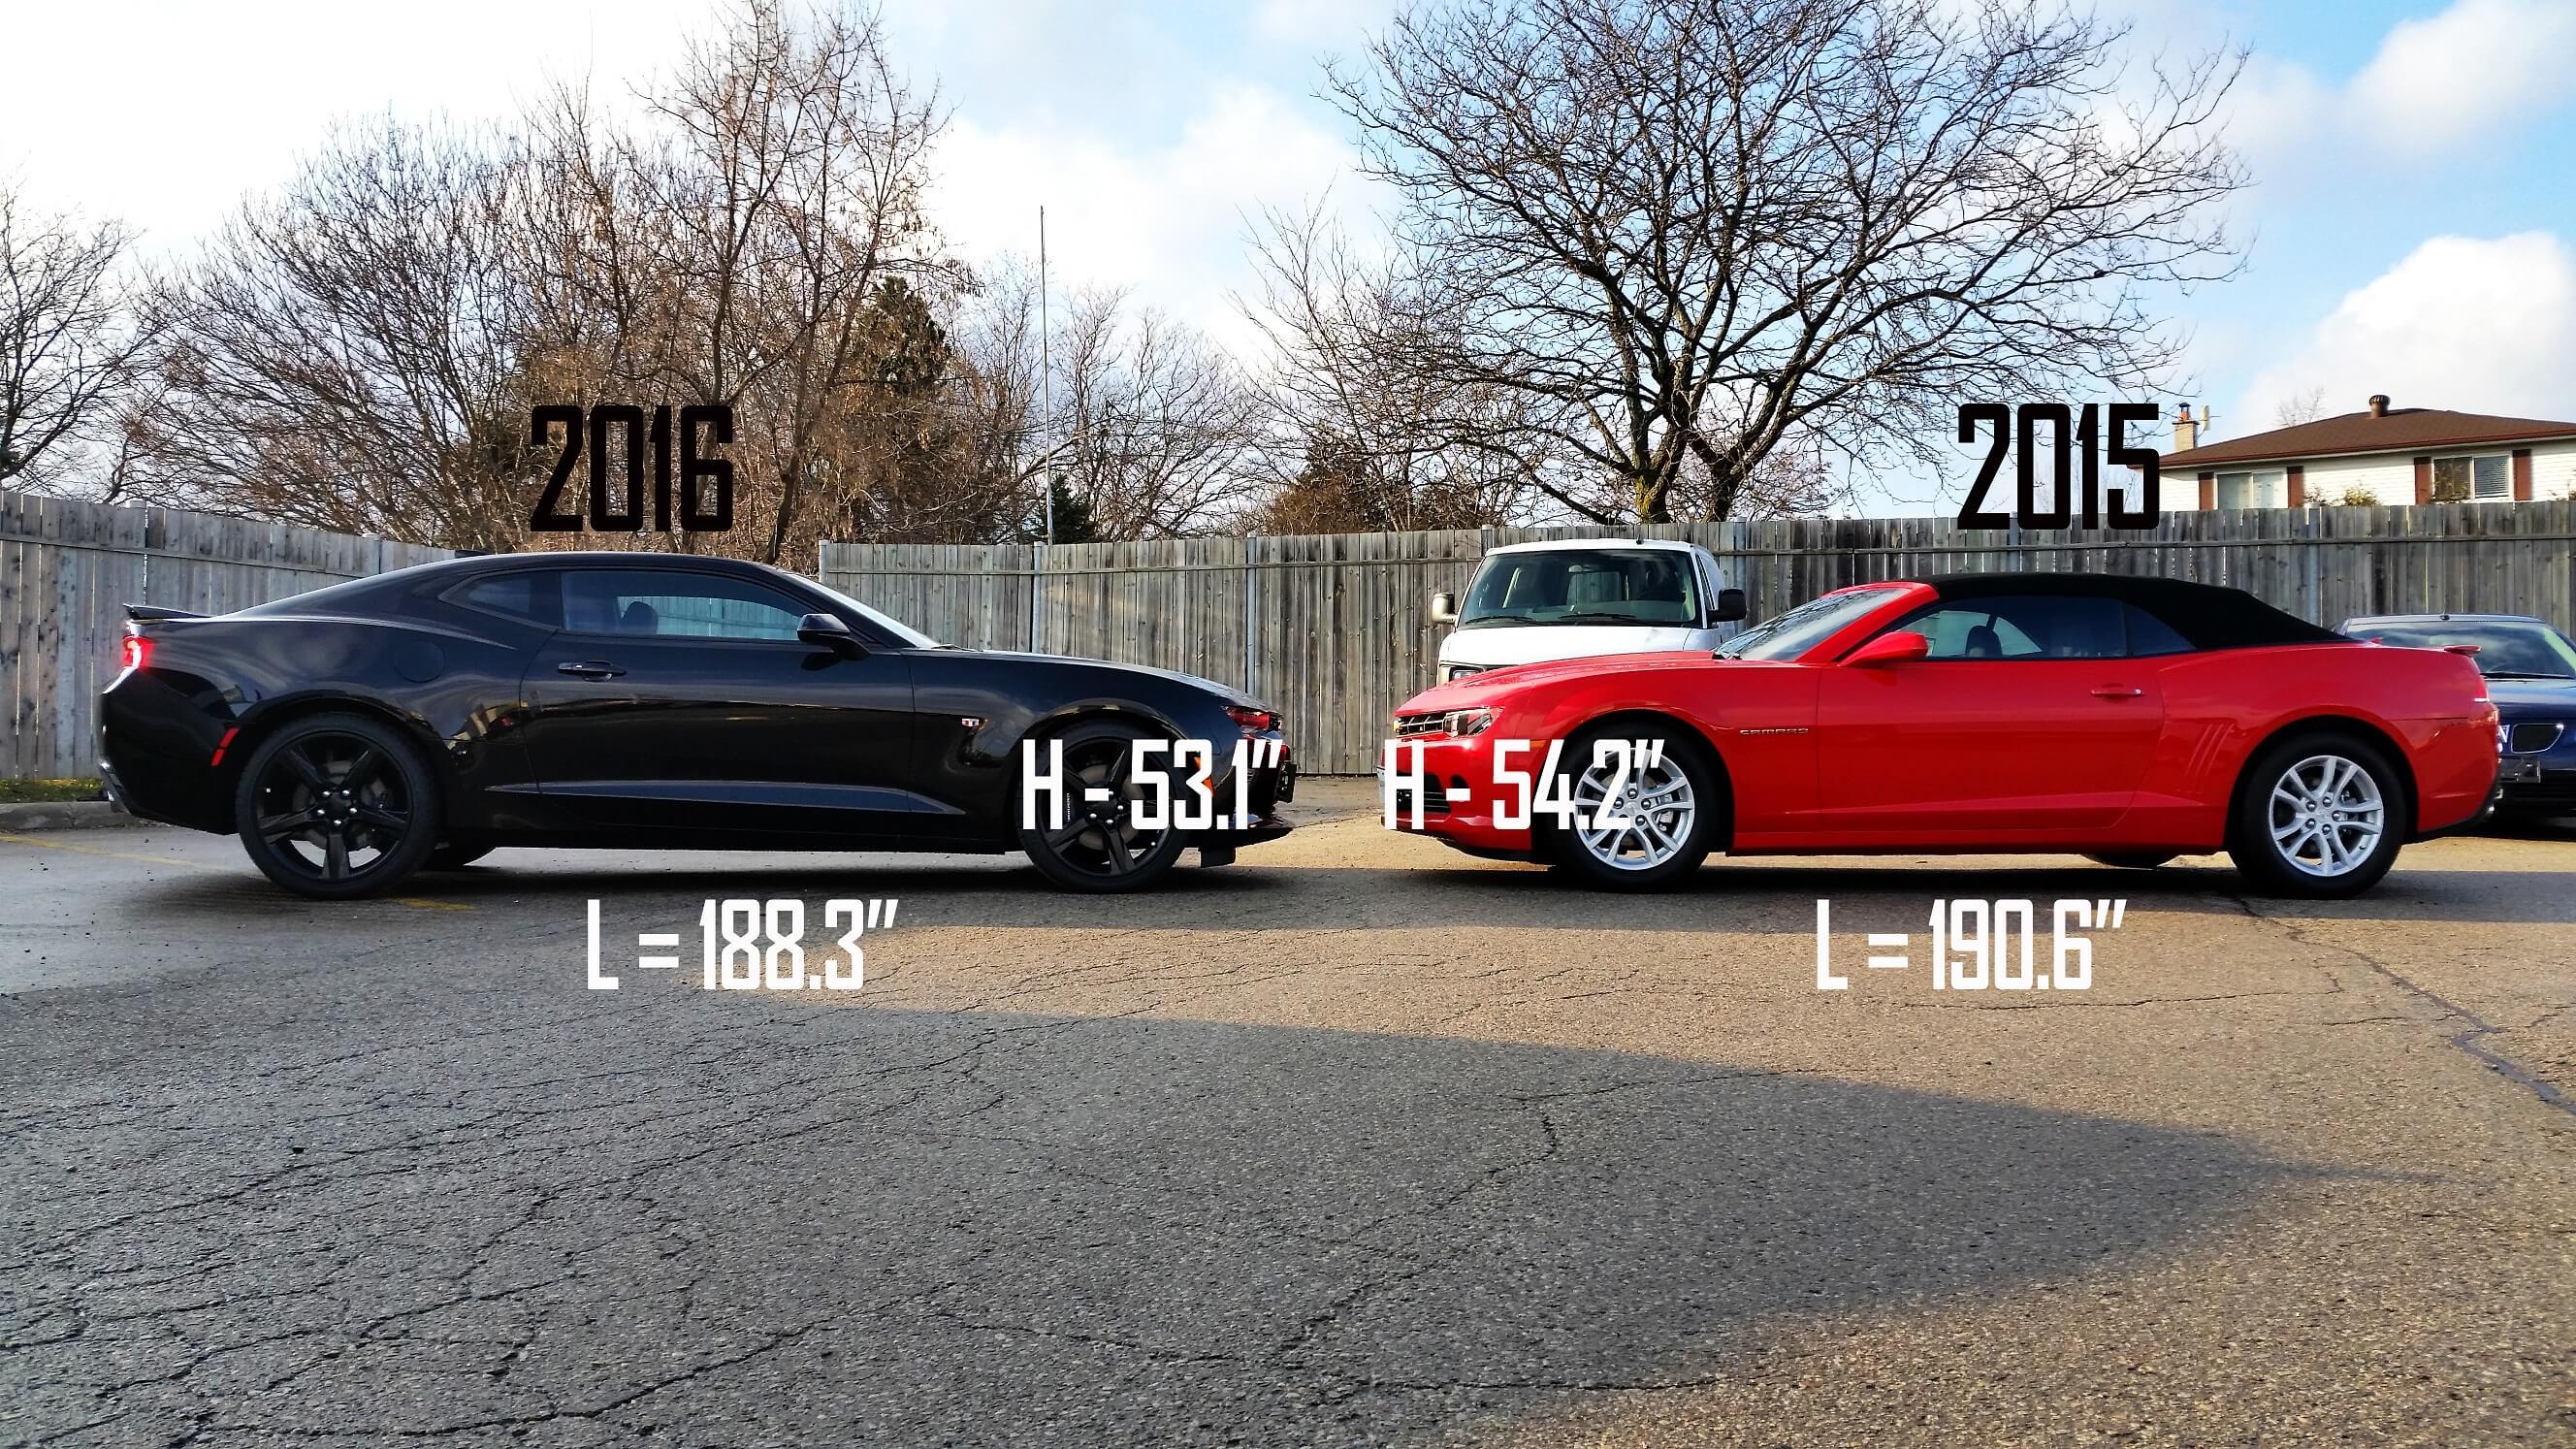 2016 Camaro Ss Dimensions